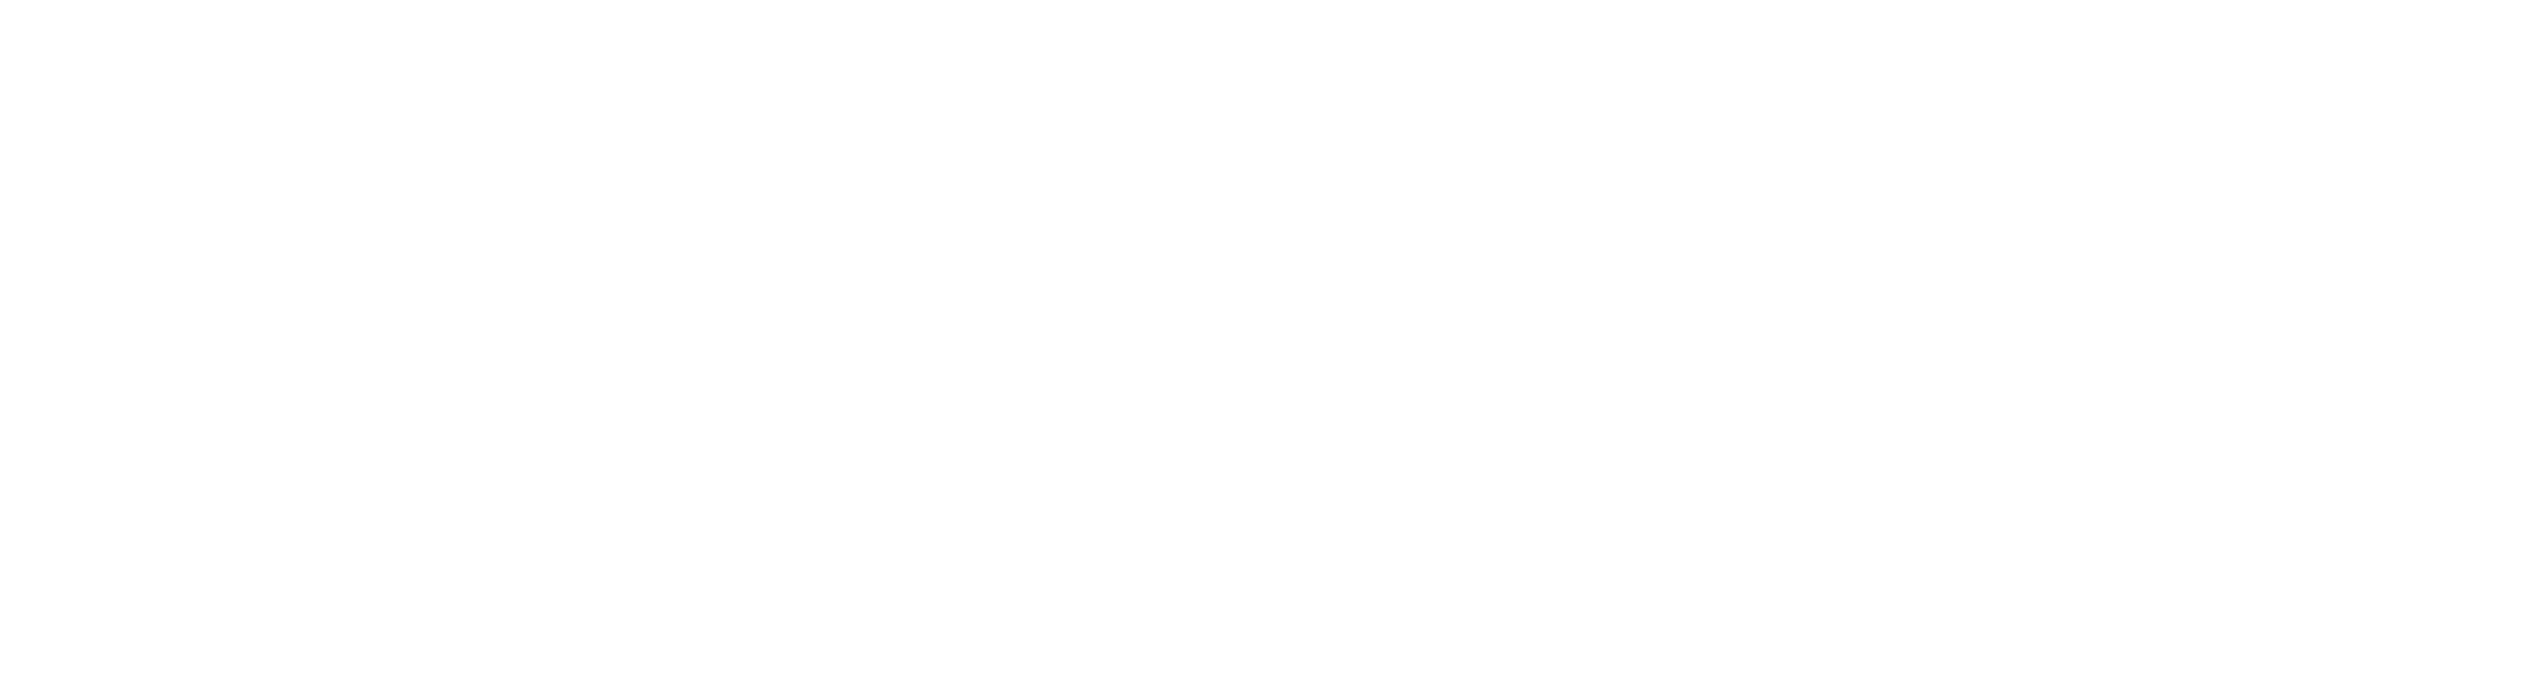 Havana logo wit op transparant-01.png